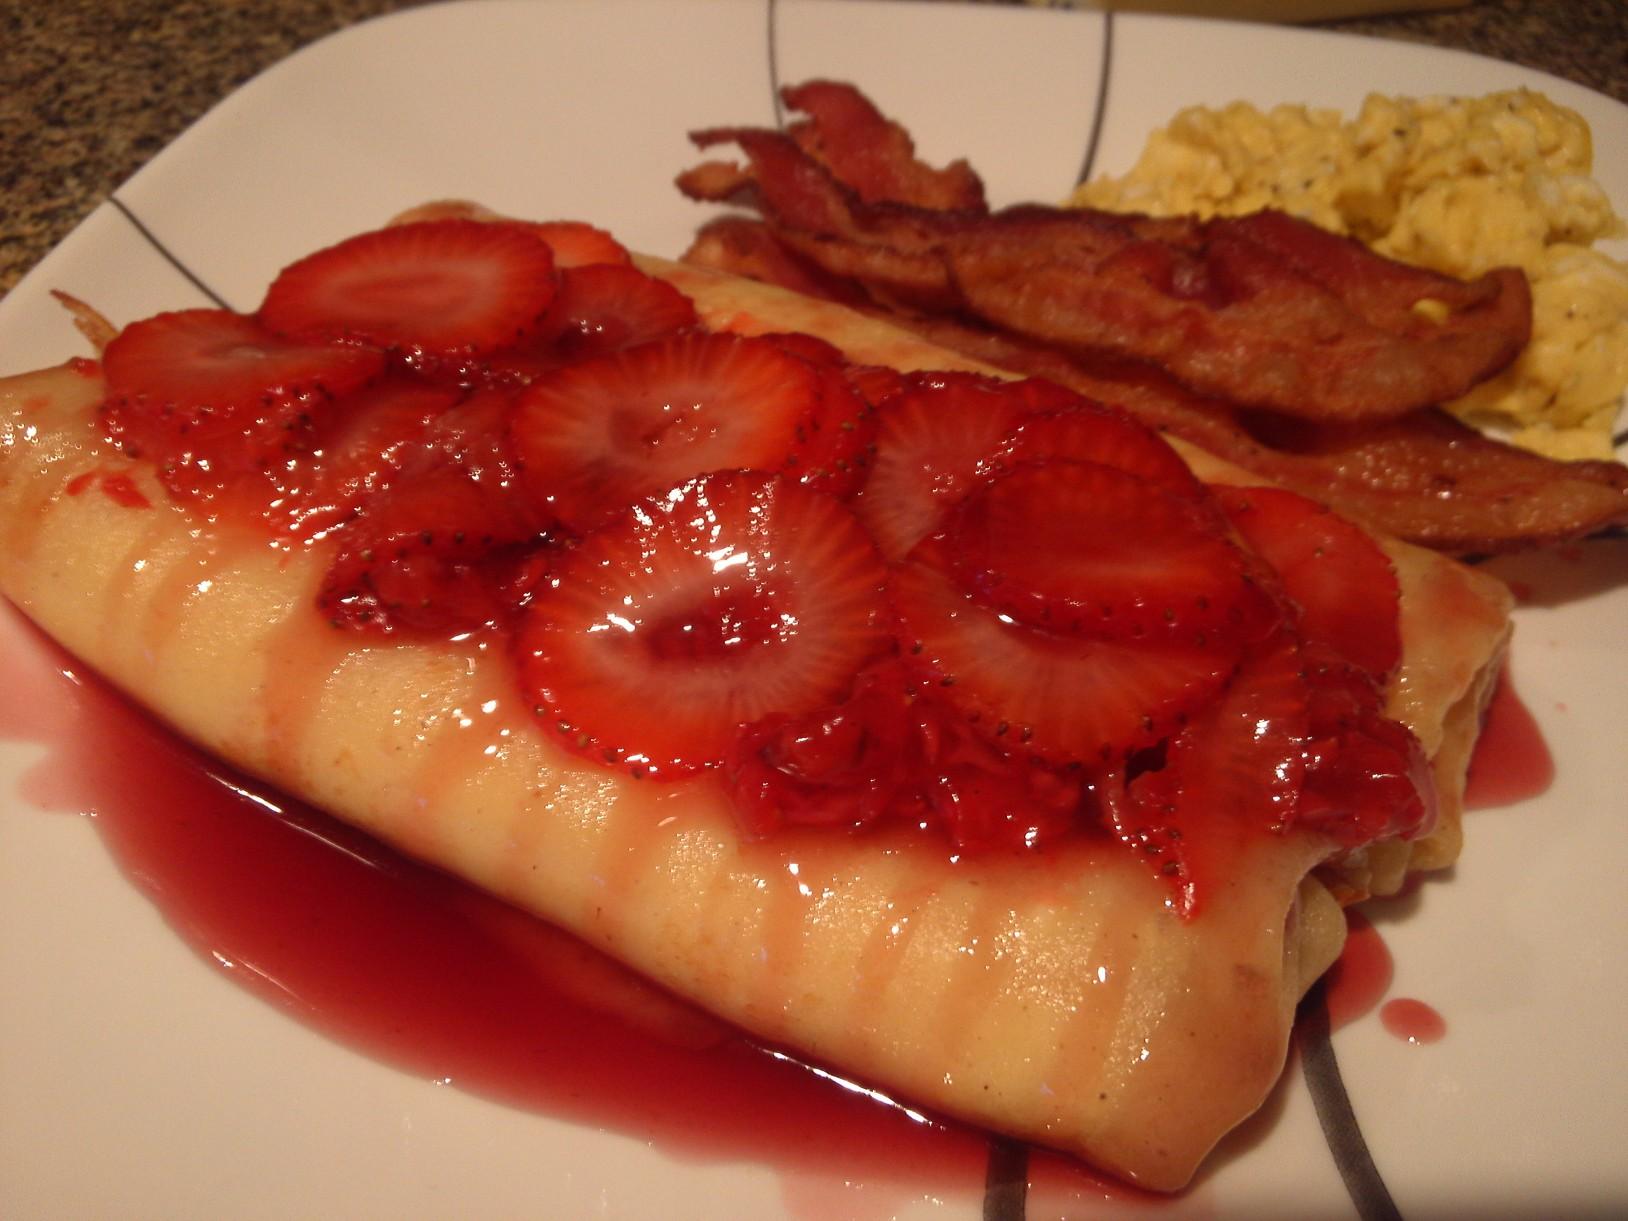 Strawberry Cheese Blintzes